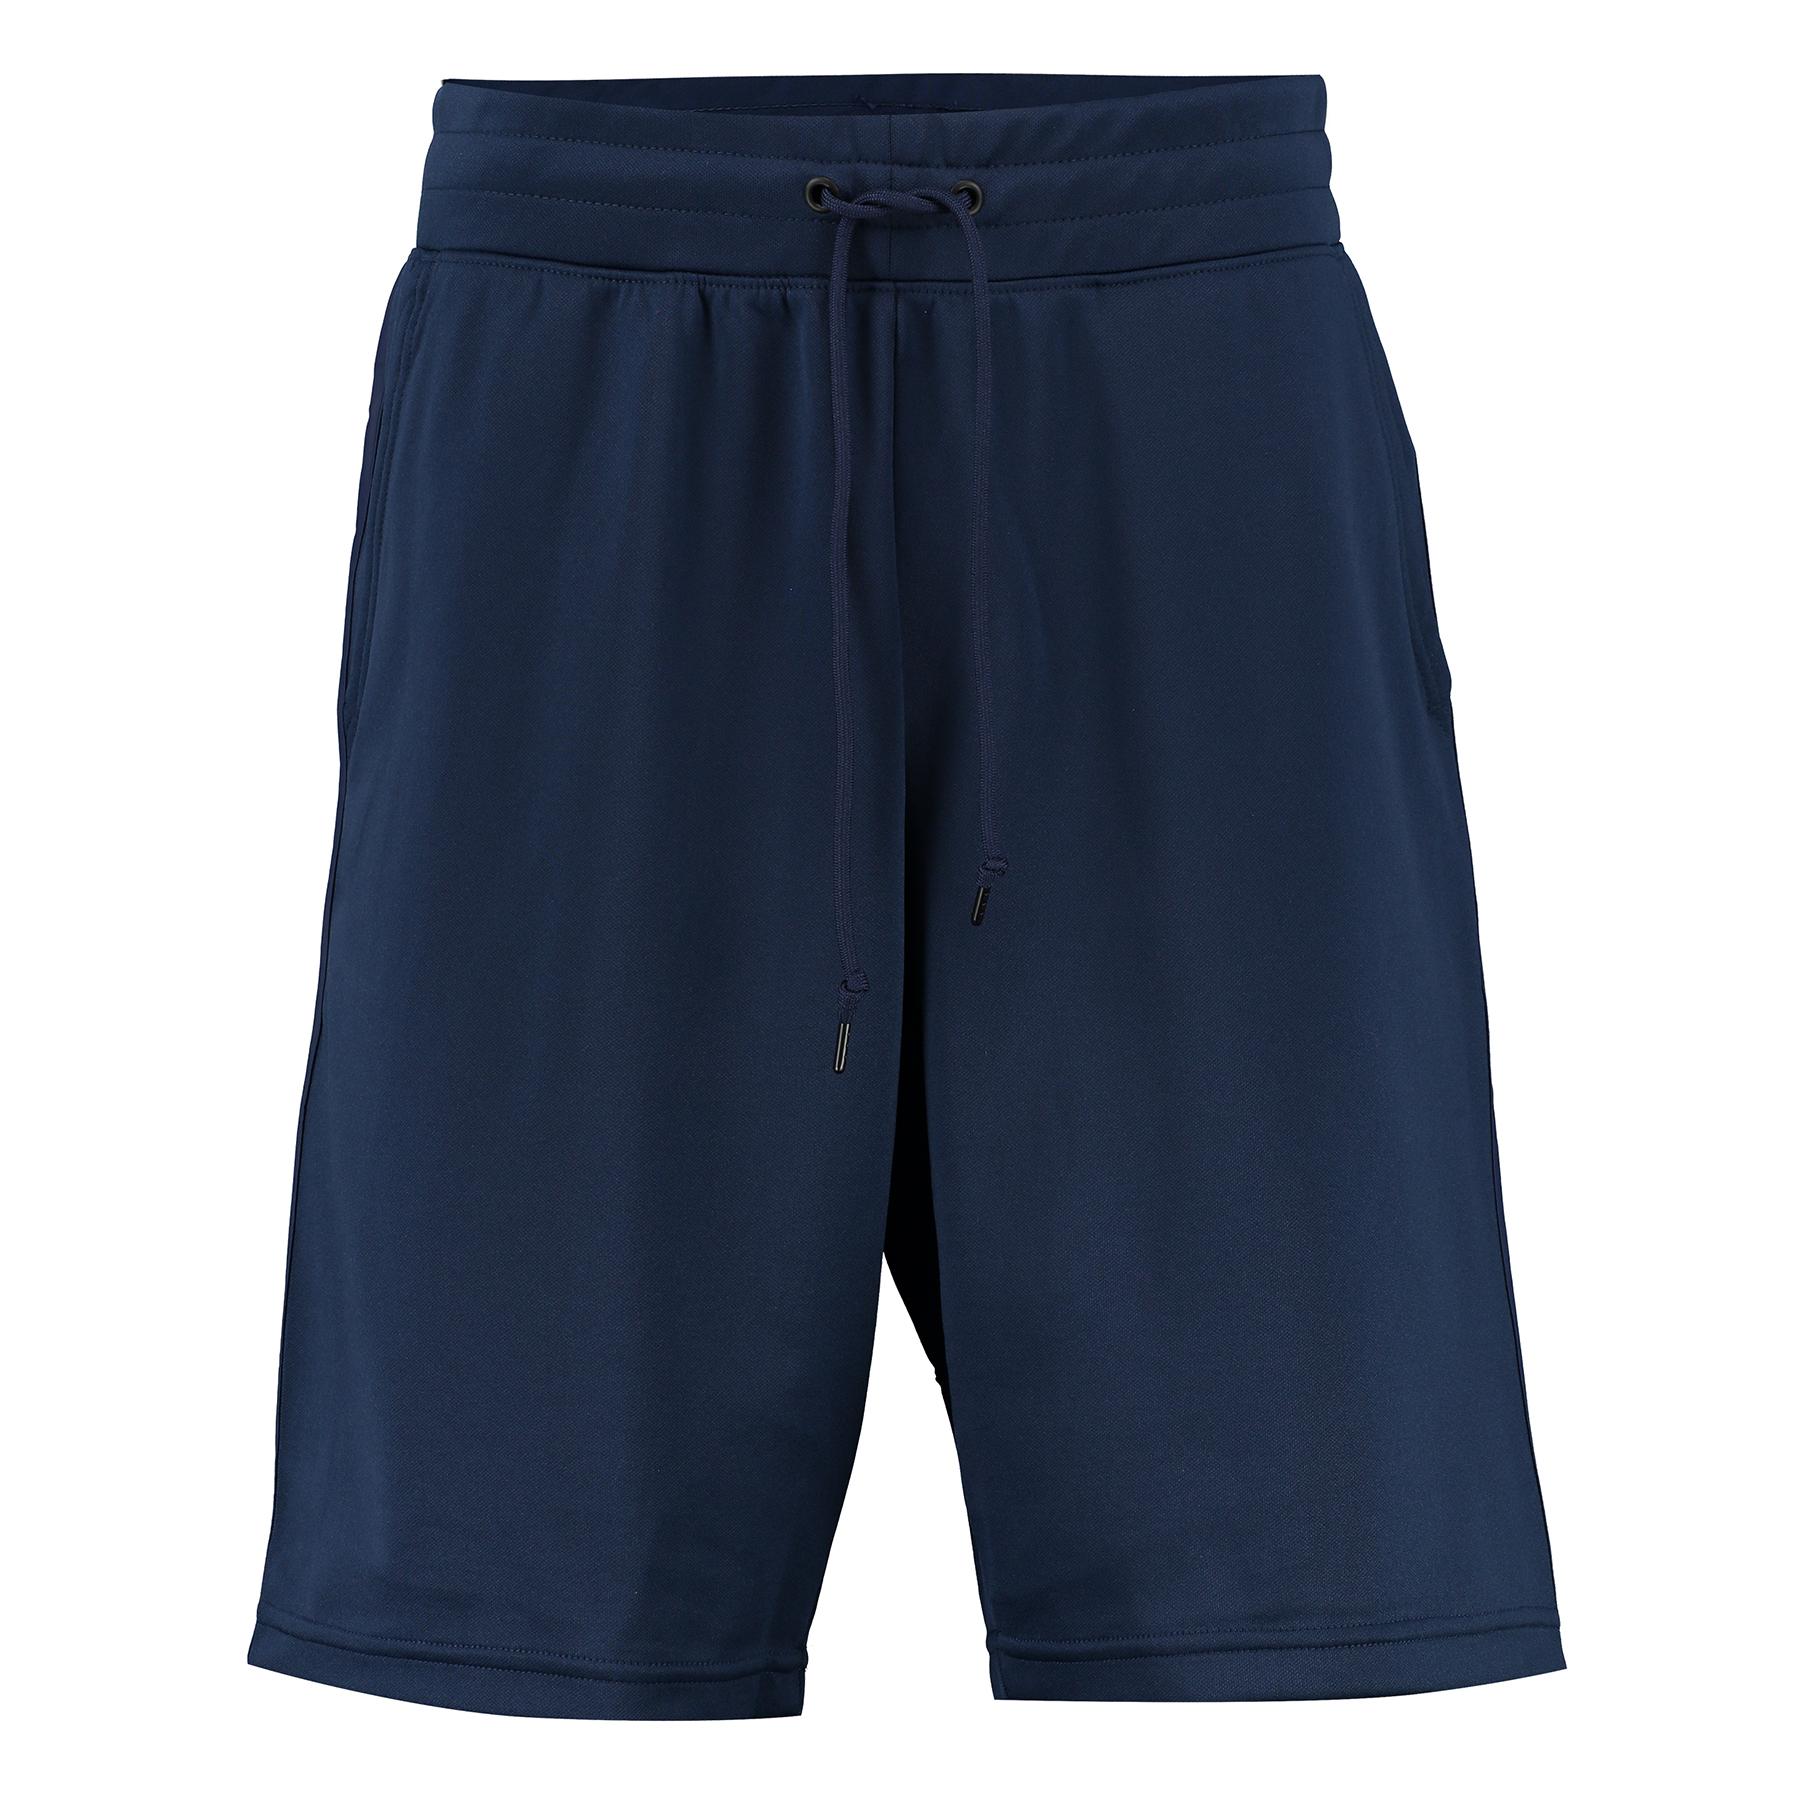 Nike F.C. Libero Shorts Navy